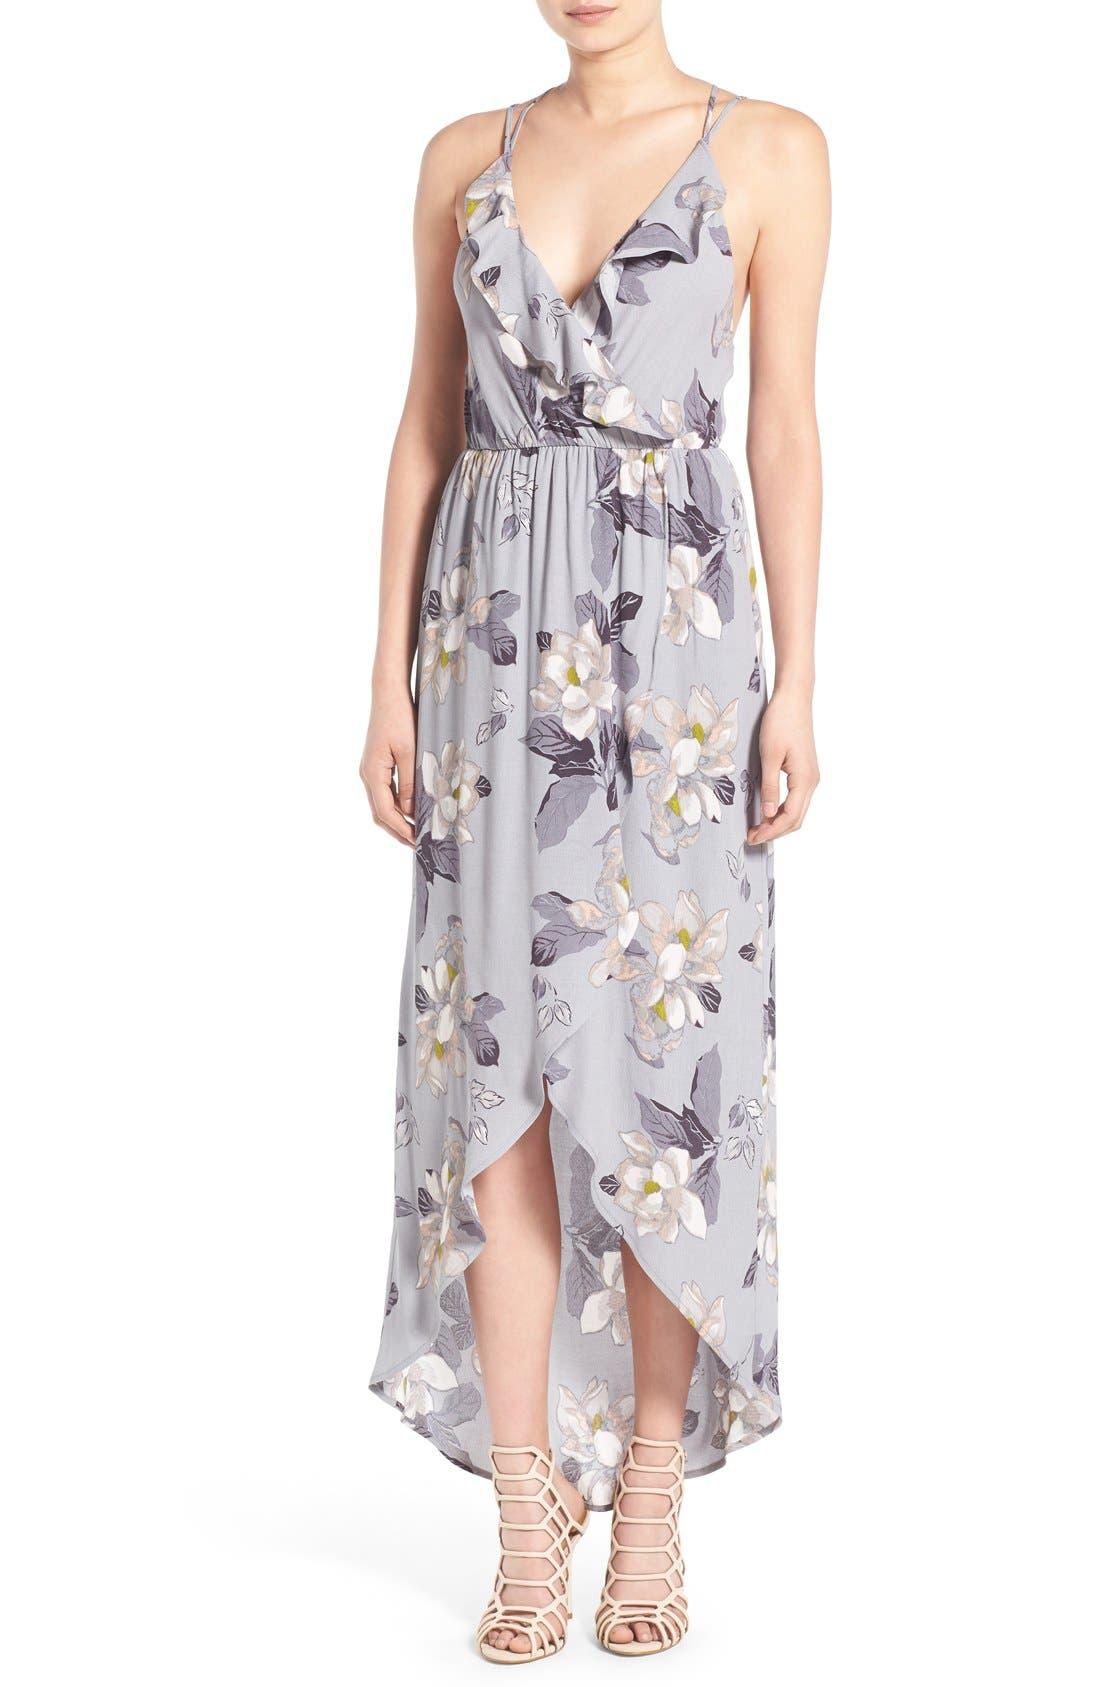 ASTR Ruffle Surplice High/Low Maxi Dress,                         Main,                         color, Grey Multi Floral